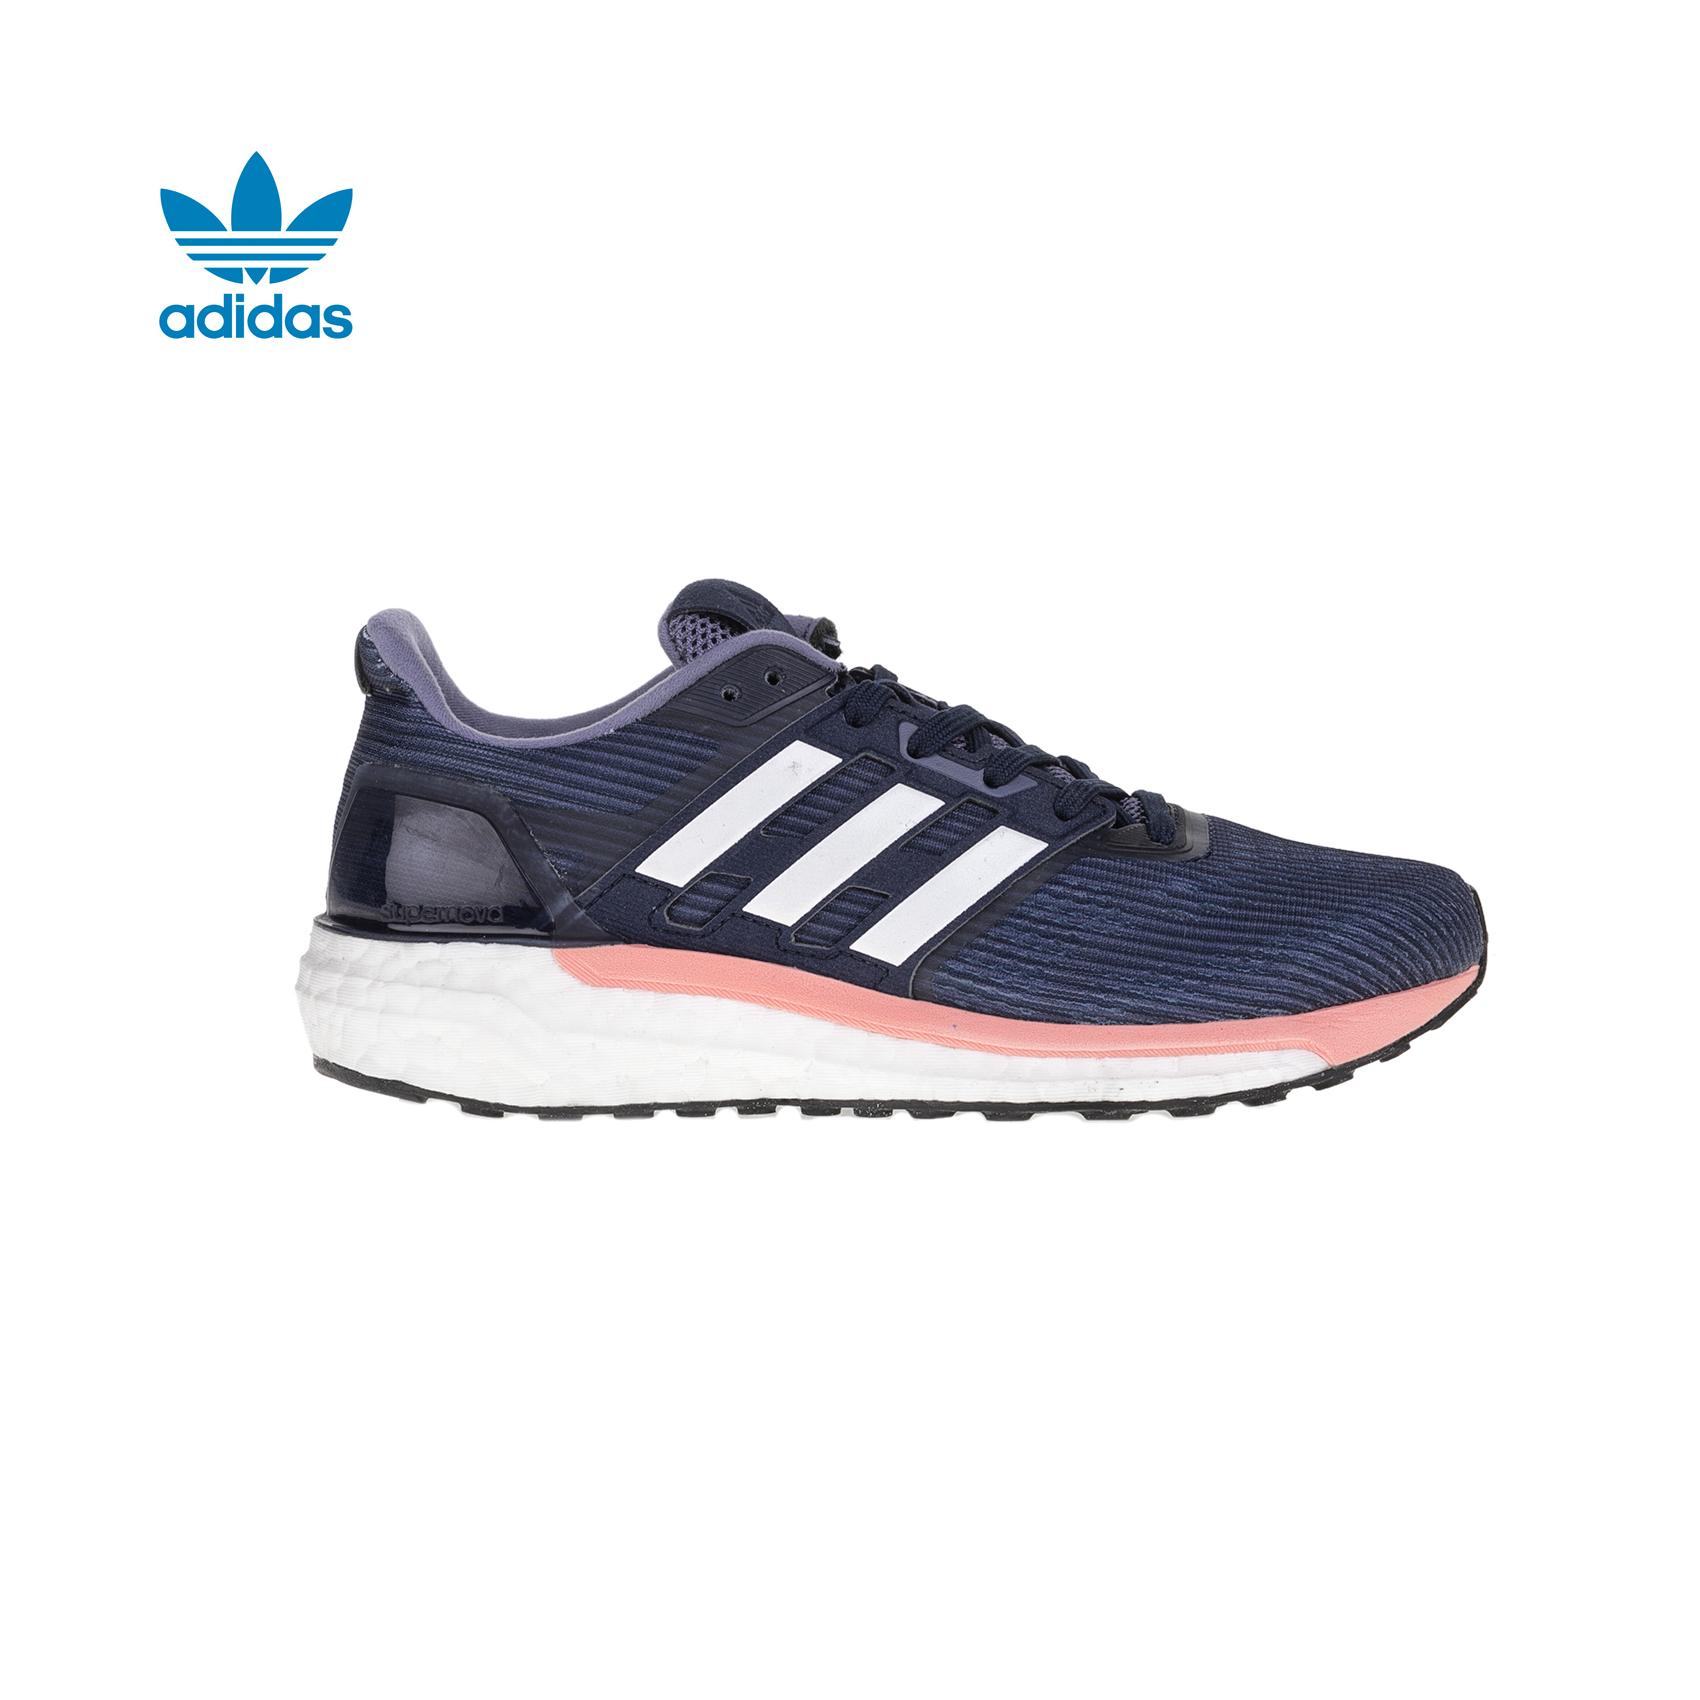 ADIDAS - Γυναικεία παπούτσια adidas supernova μπλε γυναικεία παπούτσια αθλητικά running